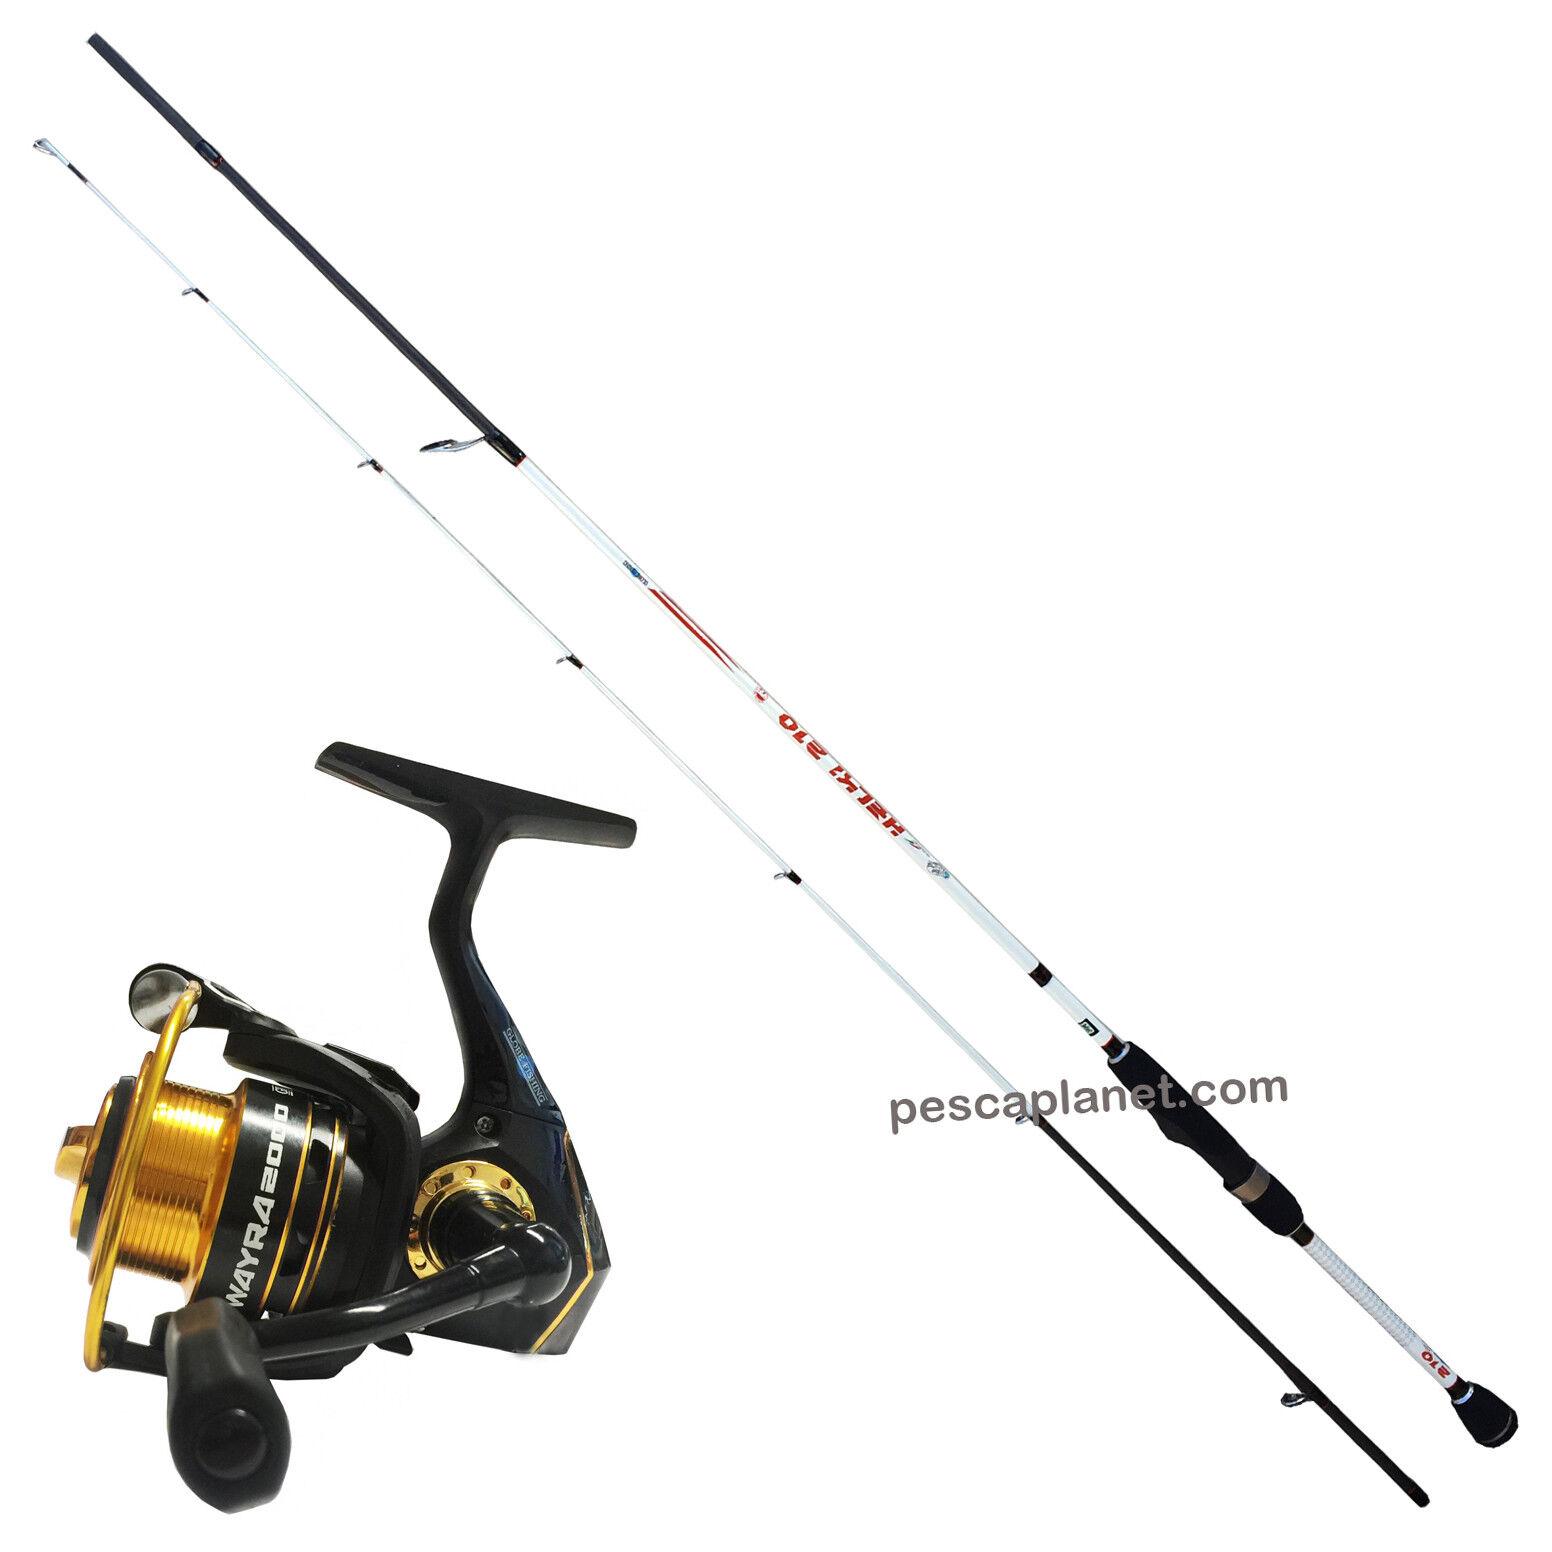 KP3550 Kit Pesca Trout Area Globe Fishing Canna Helki 1,90 m + Mulinello Wa RNG